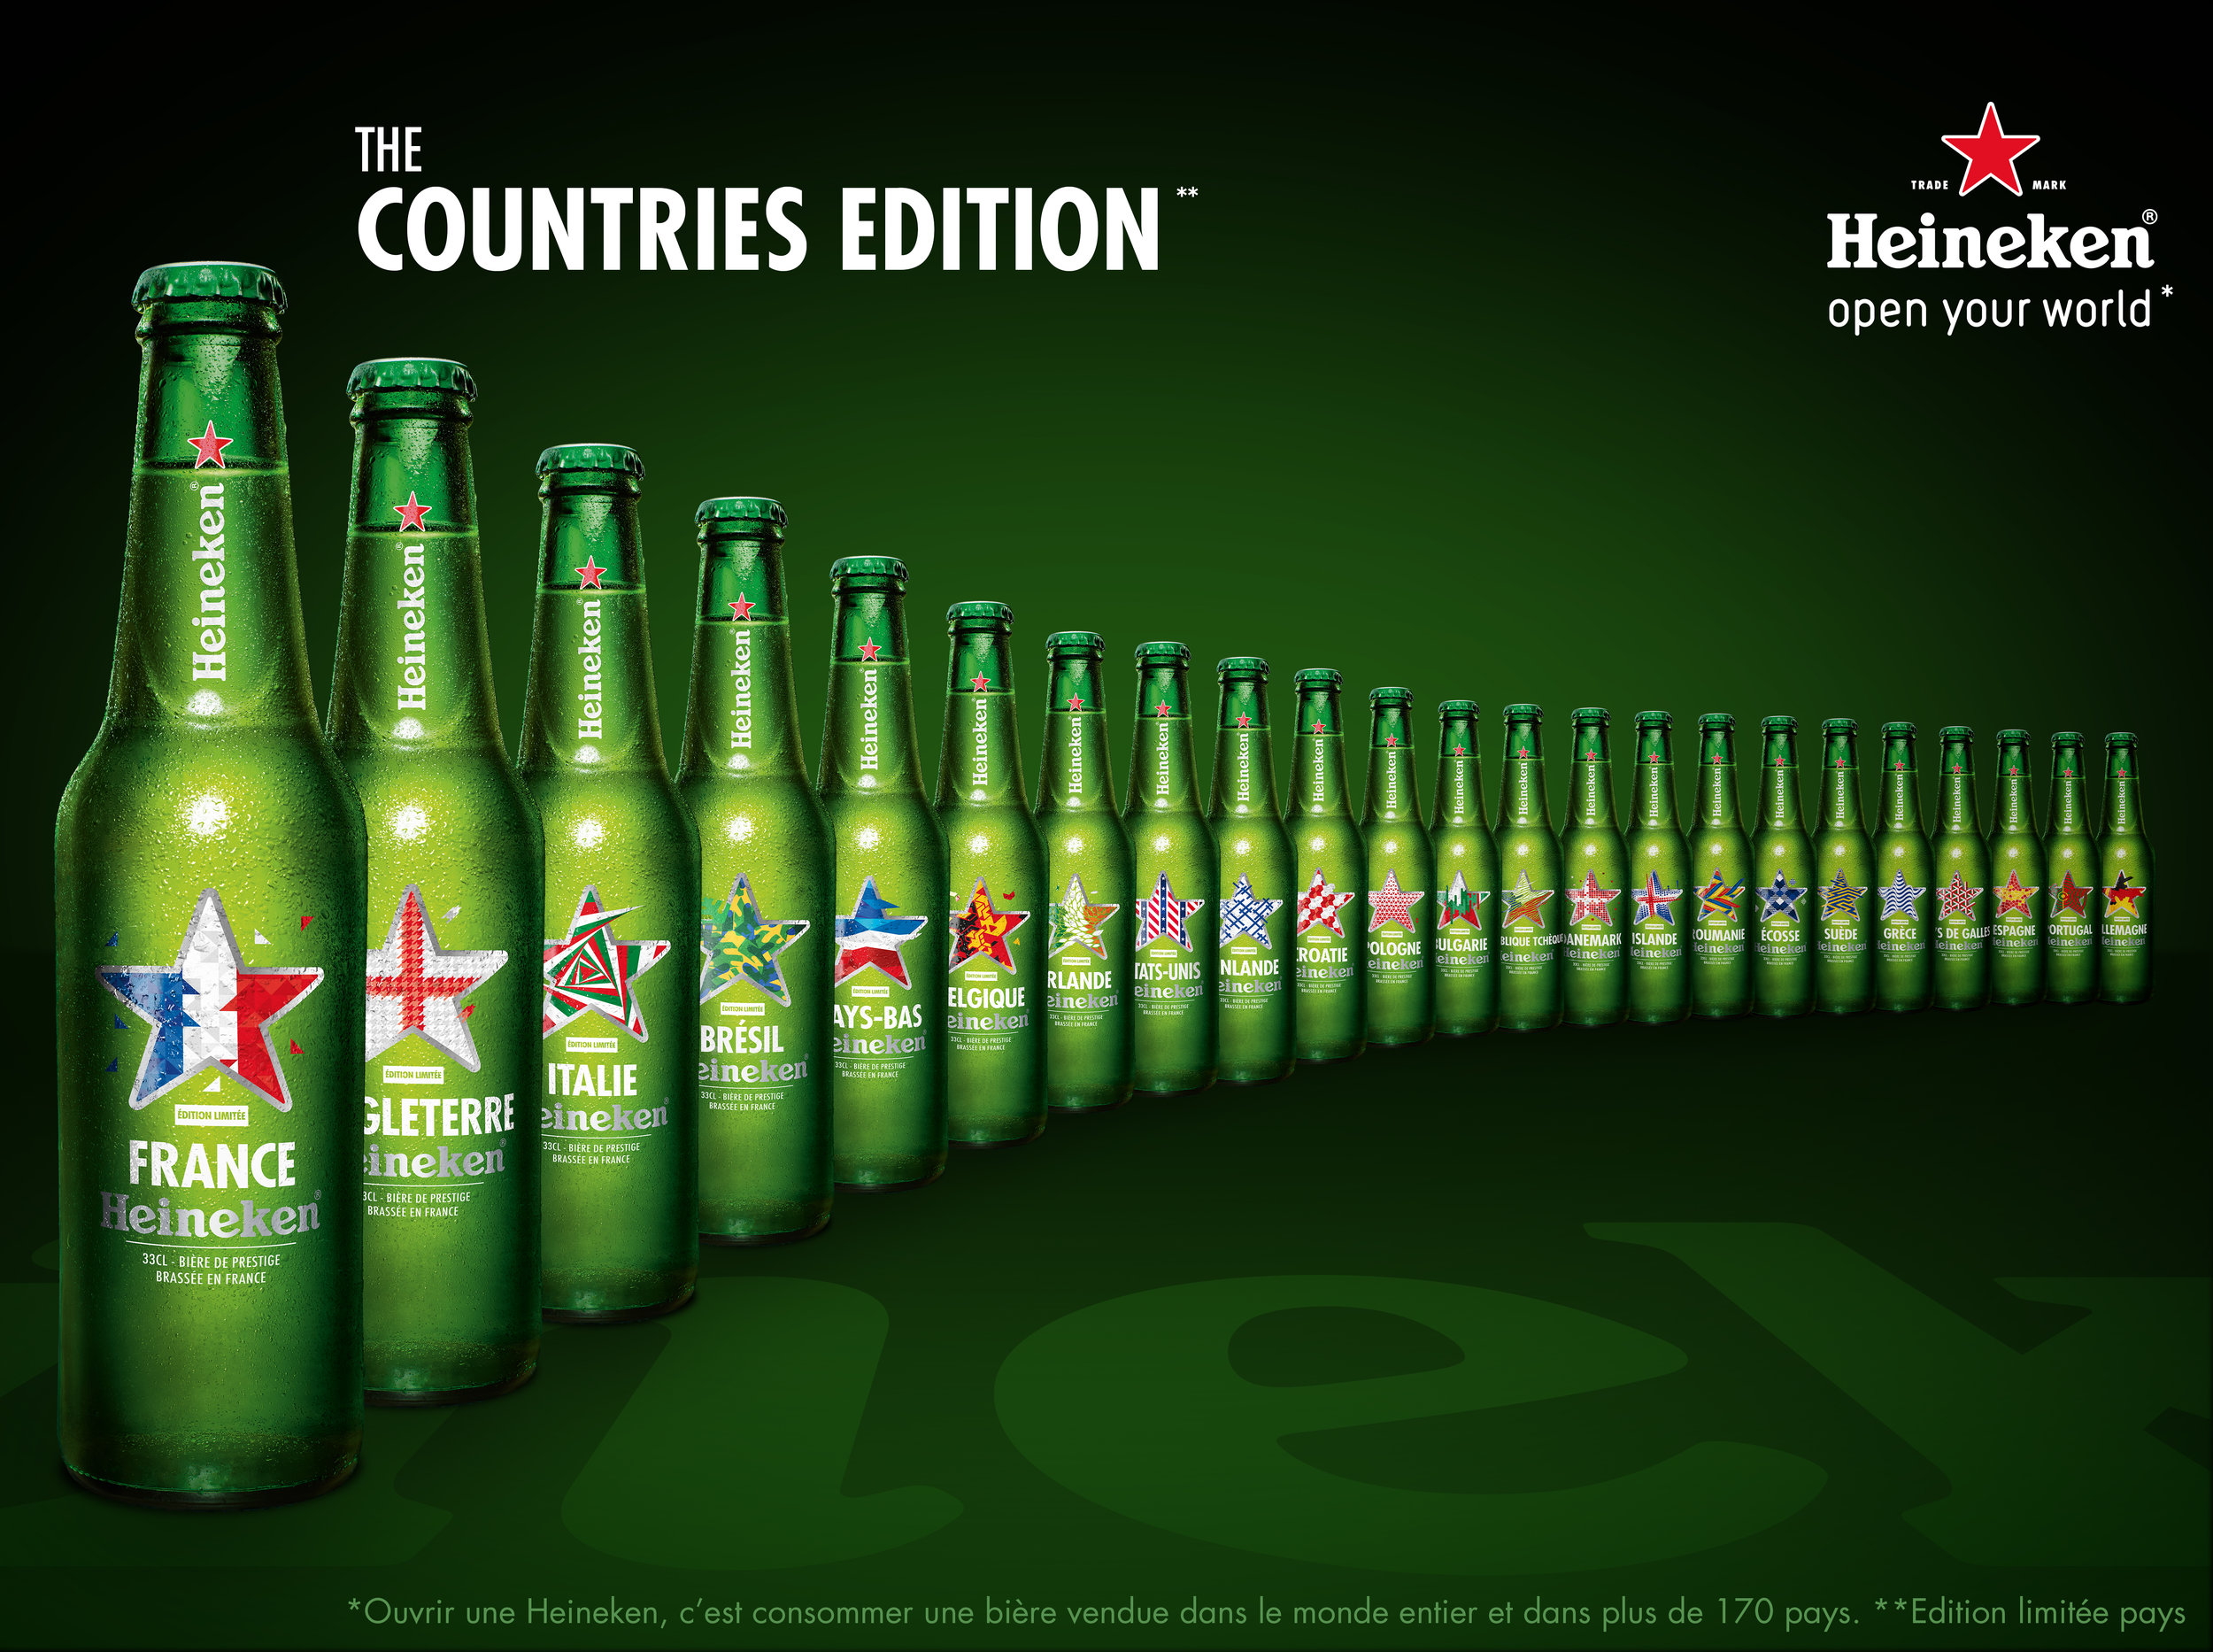 Heineken_Gamme-HD-02D.jpg